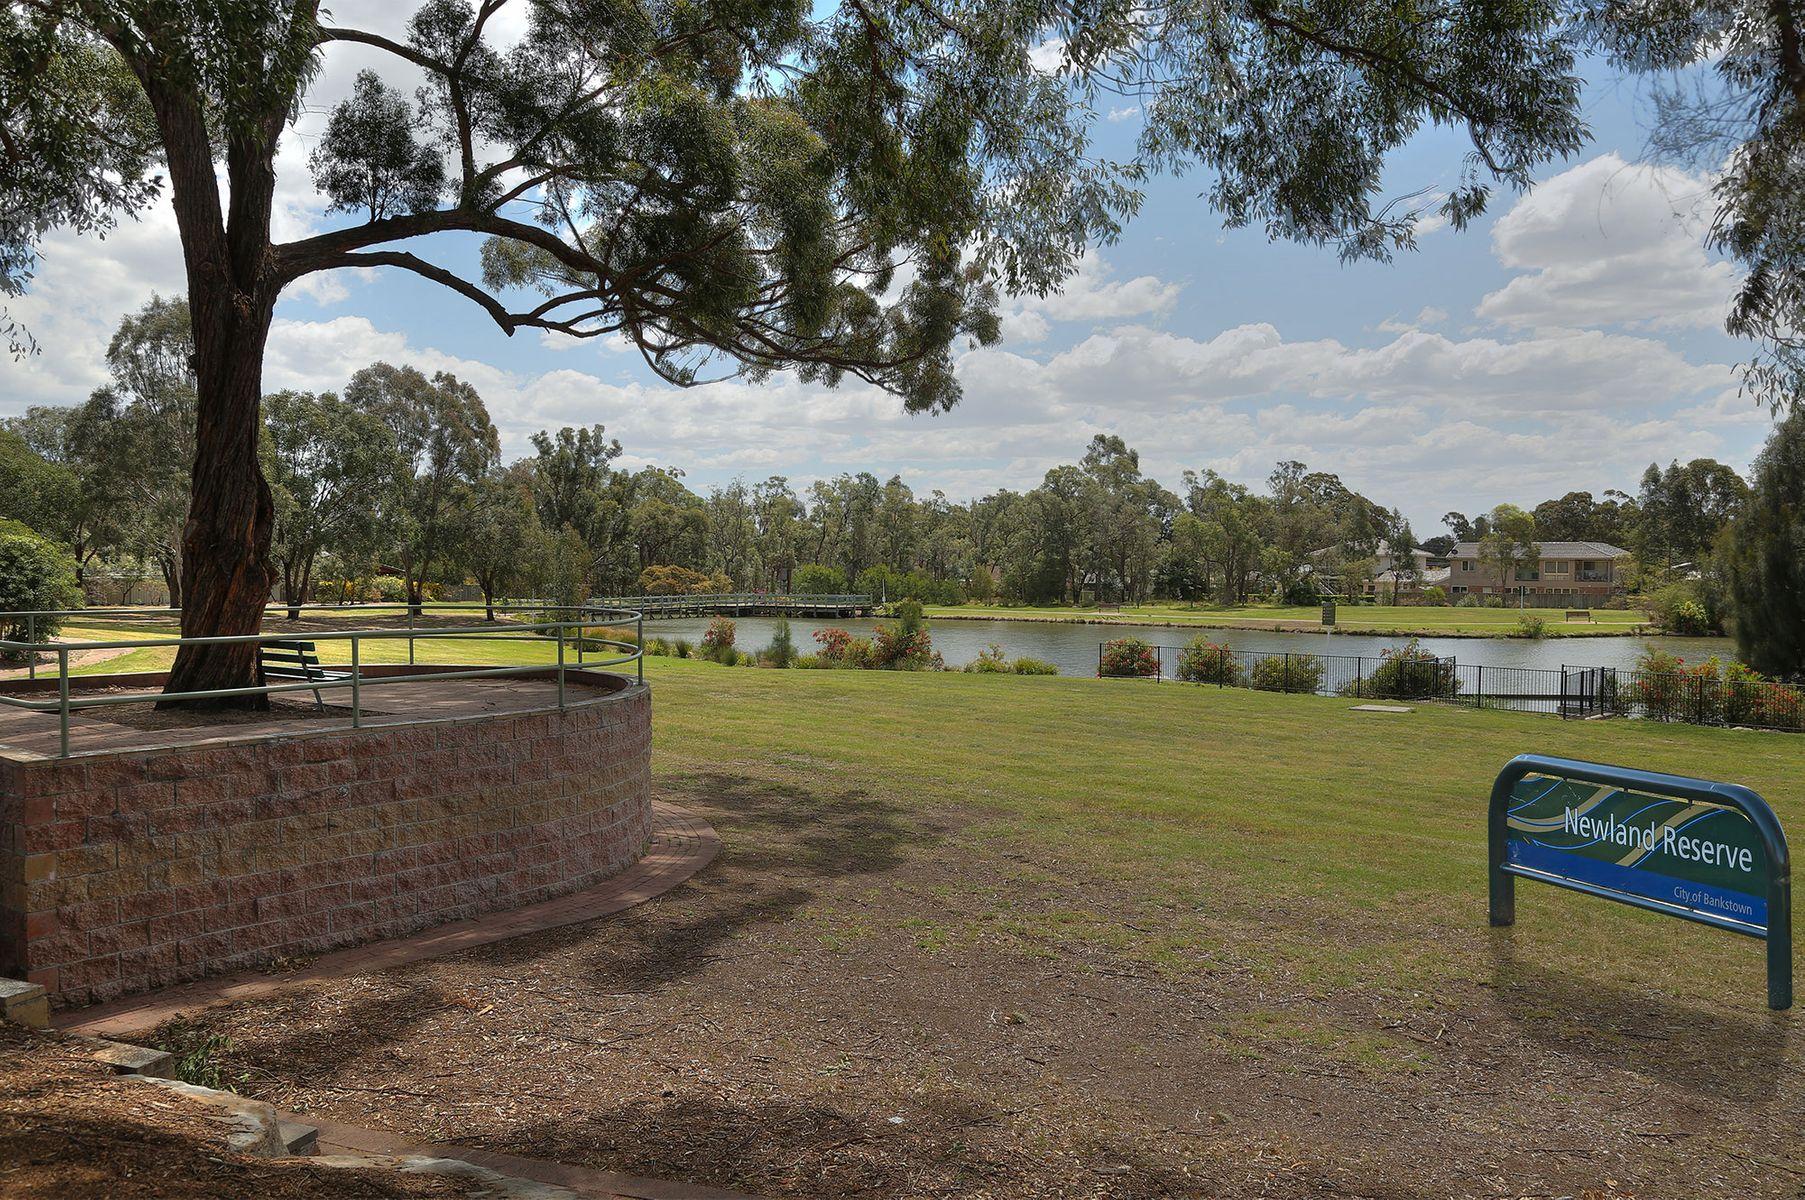 1 Newland Avenue, Milperra, NSW 2214